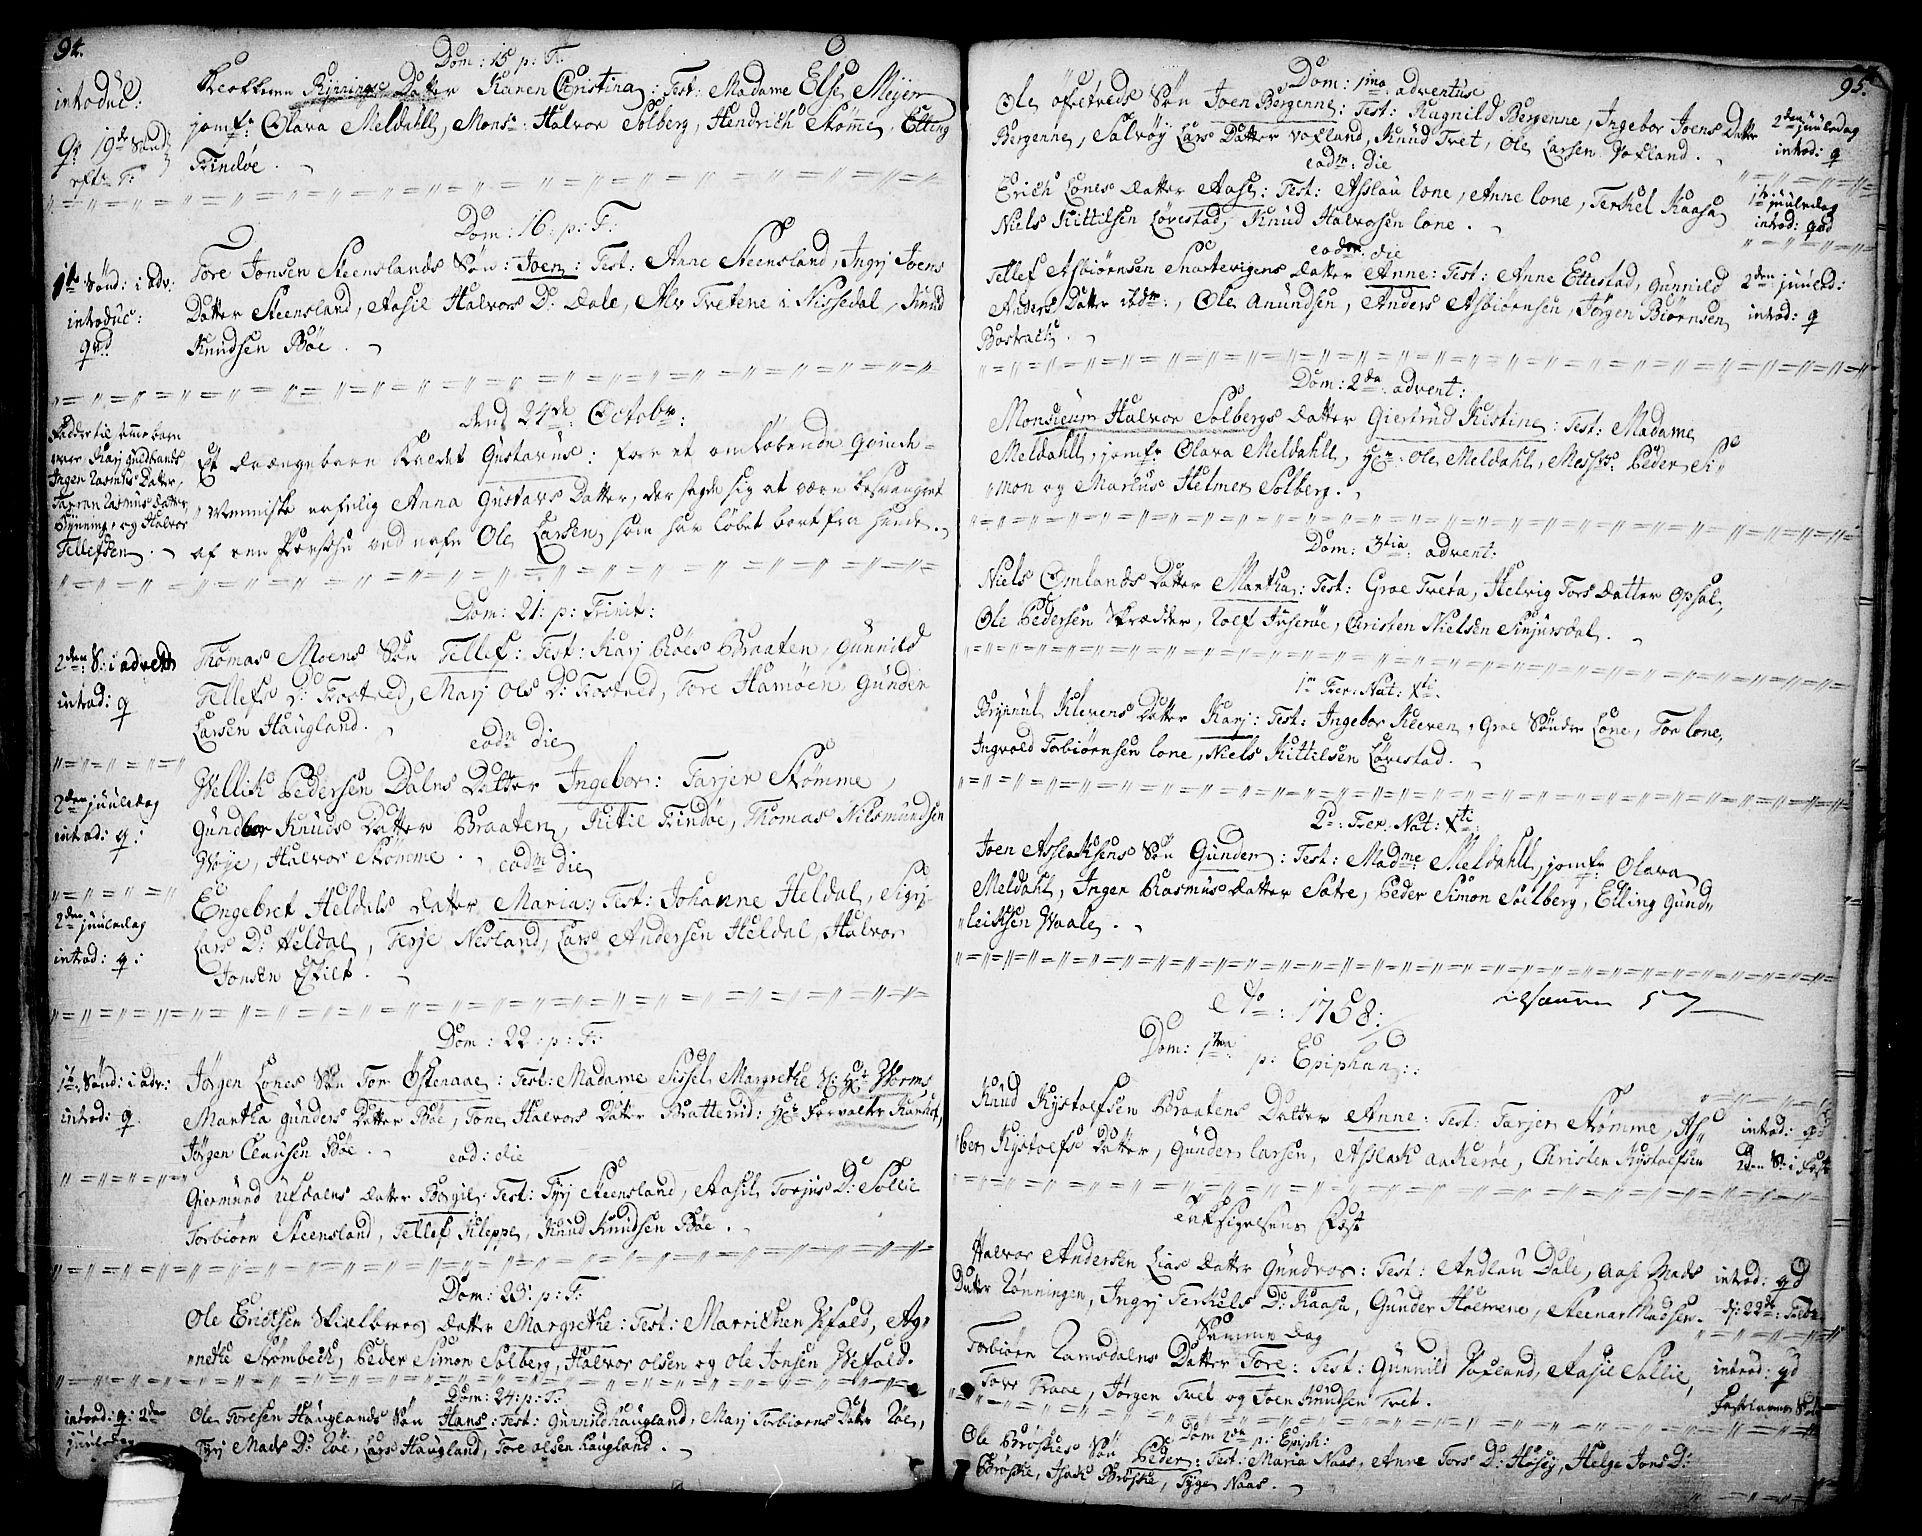 SAKO, Drangedal kirkebøker, F/Fa/L0001: Ministerialbok nr. 1, 1697-1767, s. 94-95